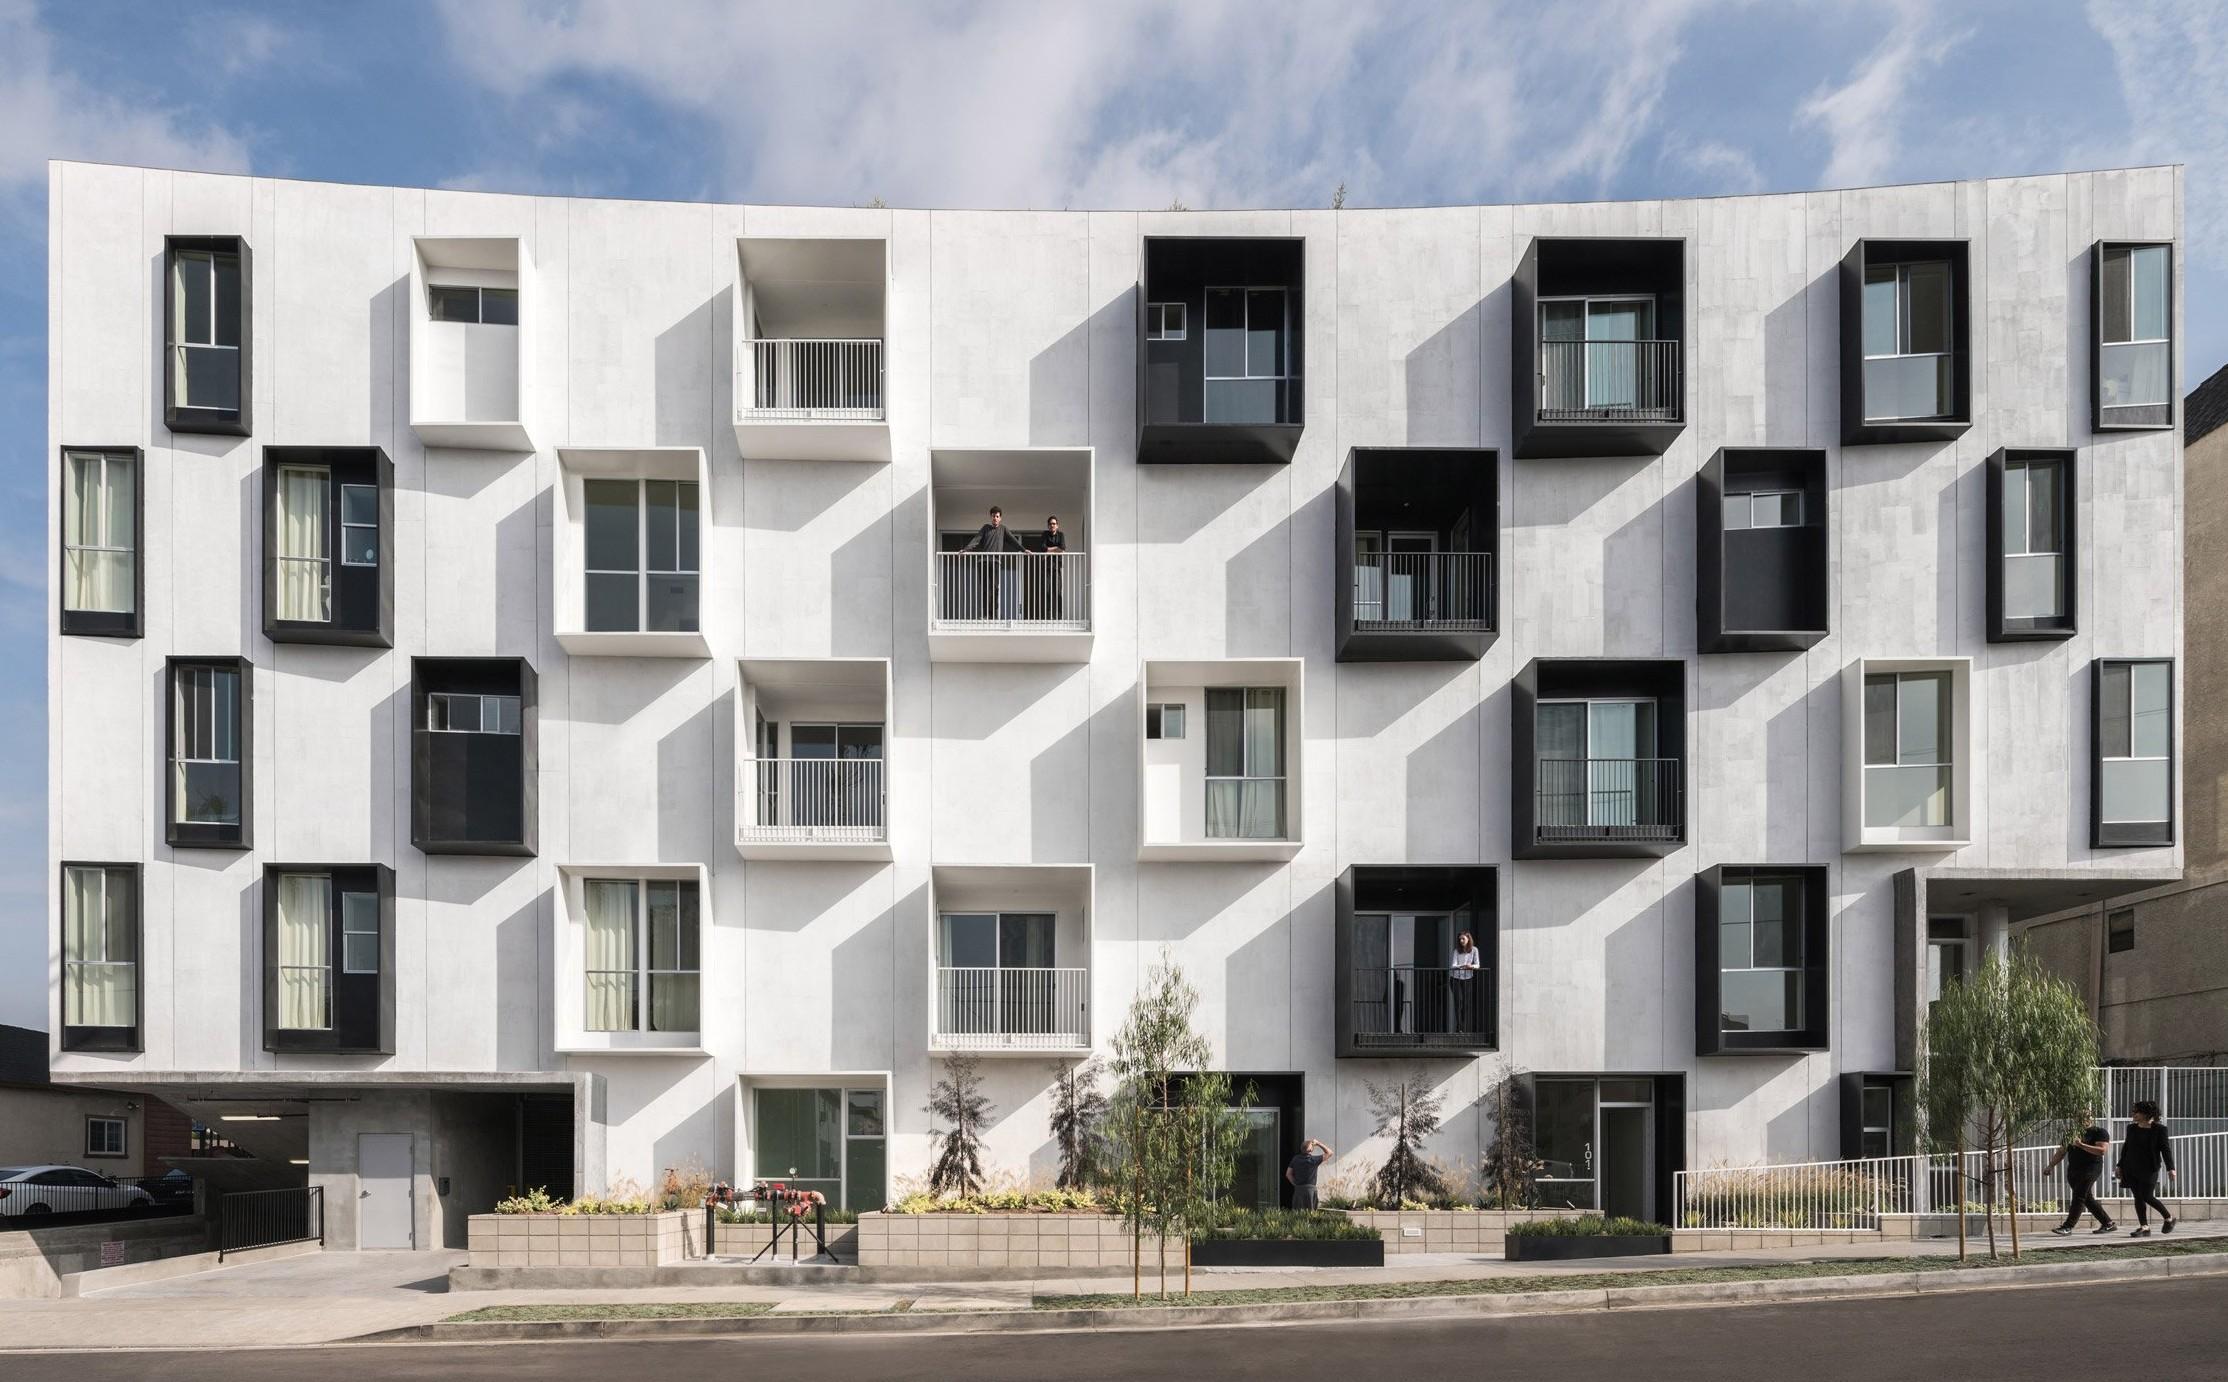 mariposa138-loha-architecture-residential-apartments-la_dezeen_2364_col_14